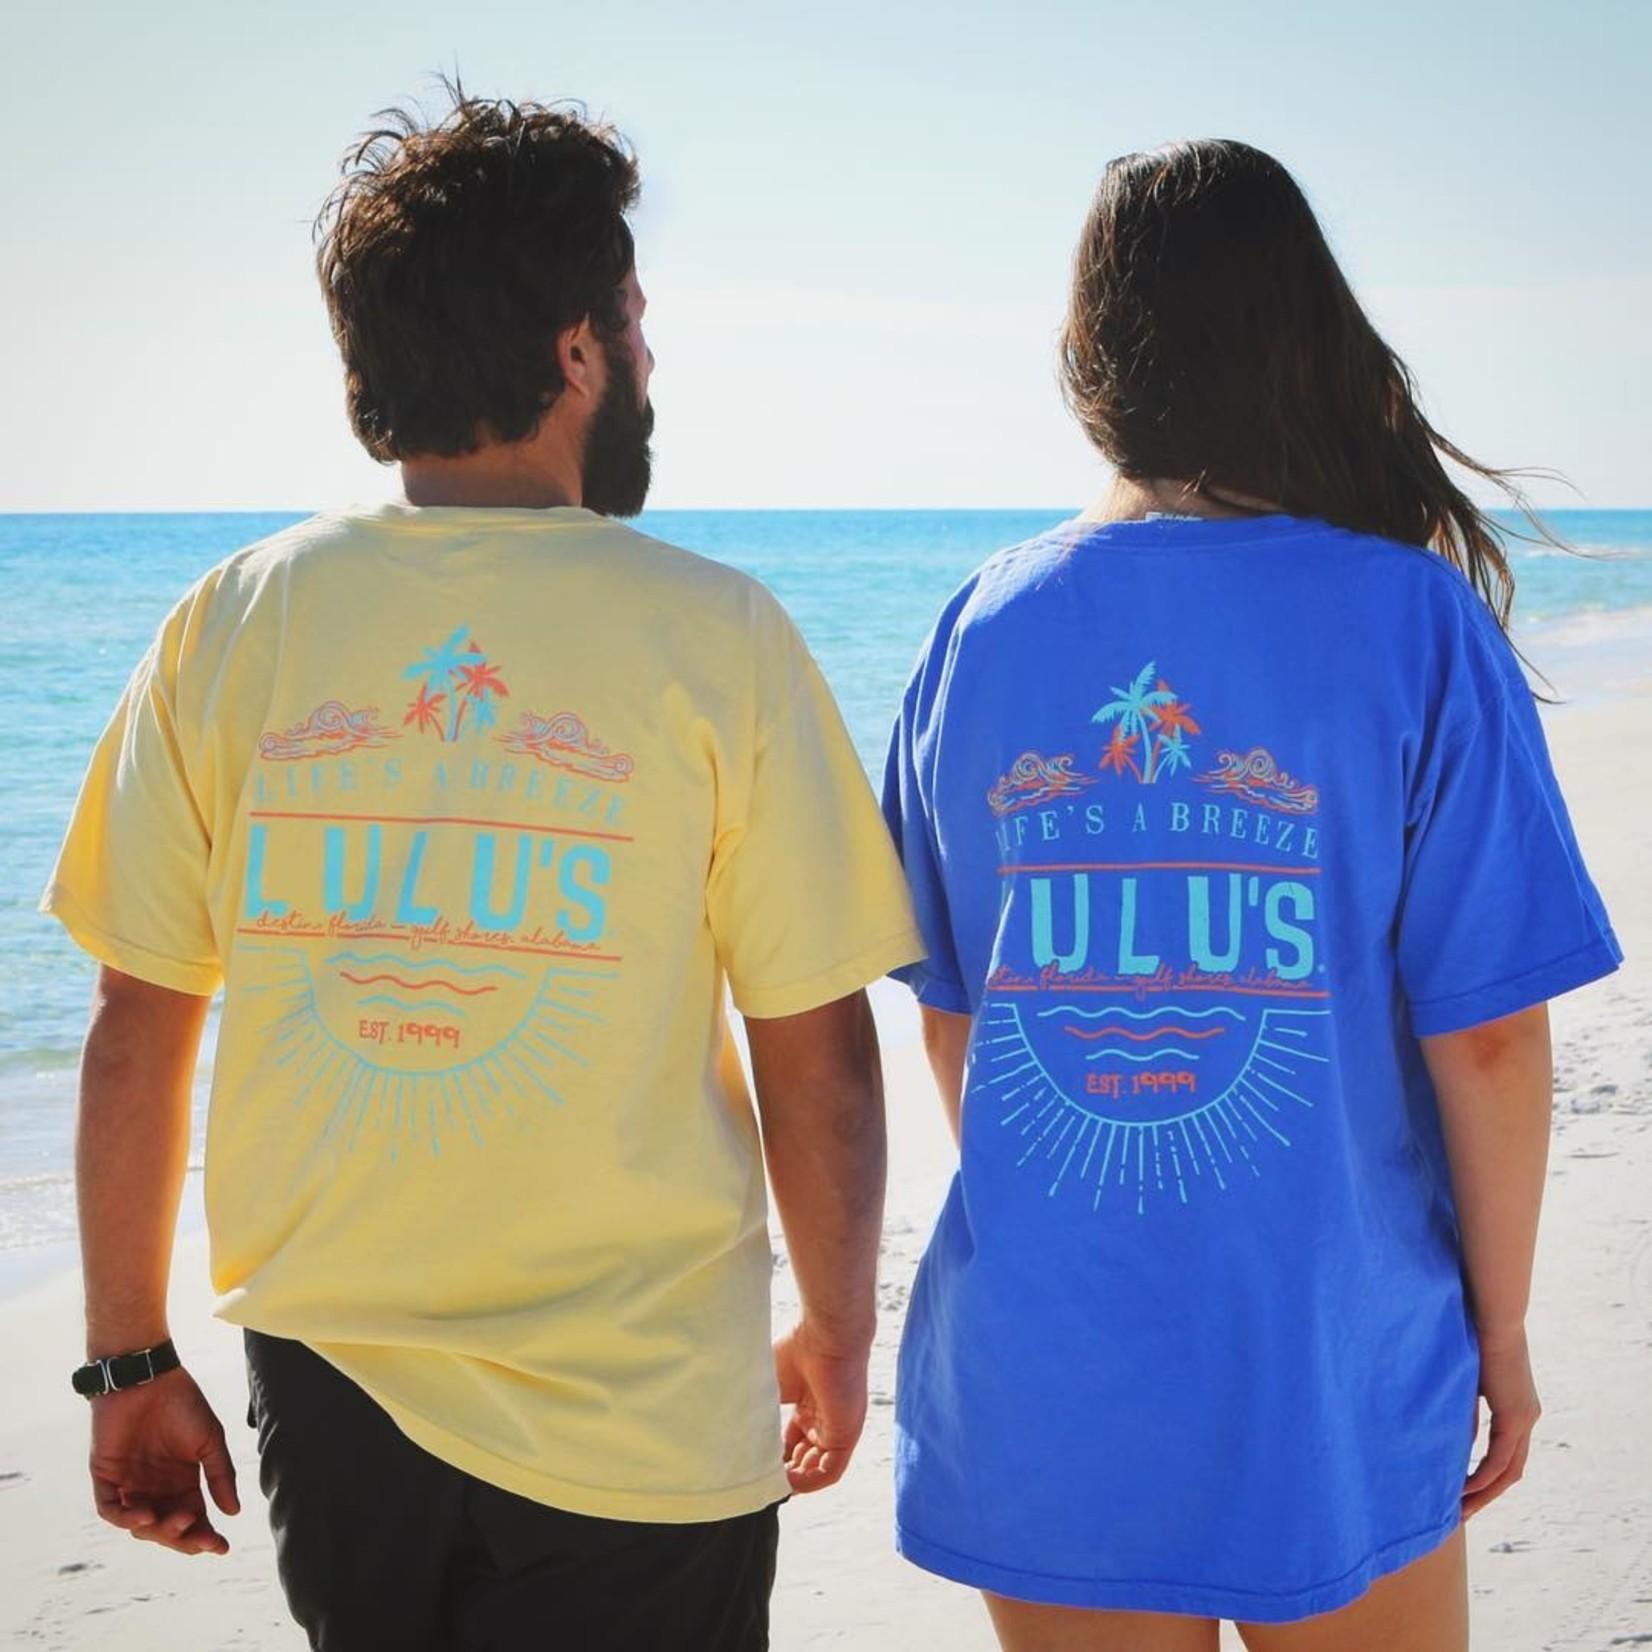 LuLu's Brand Apparel Lifes A Breeze Tee